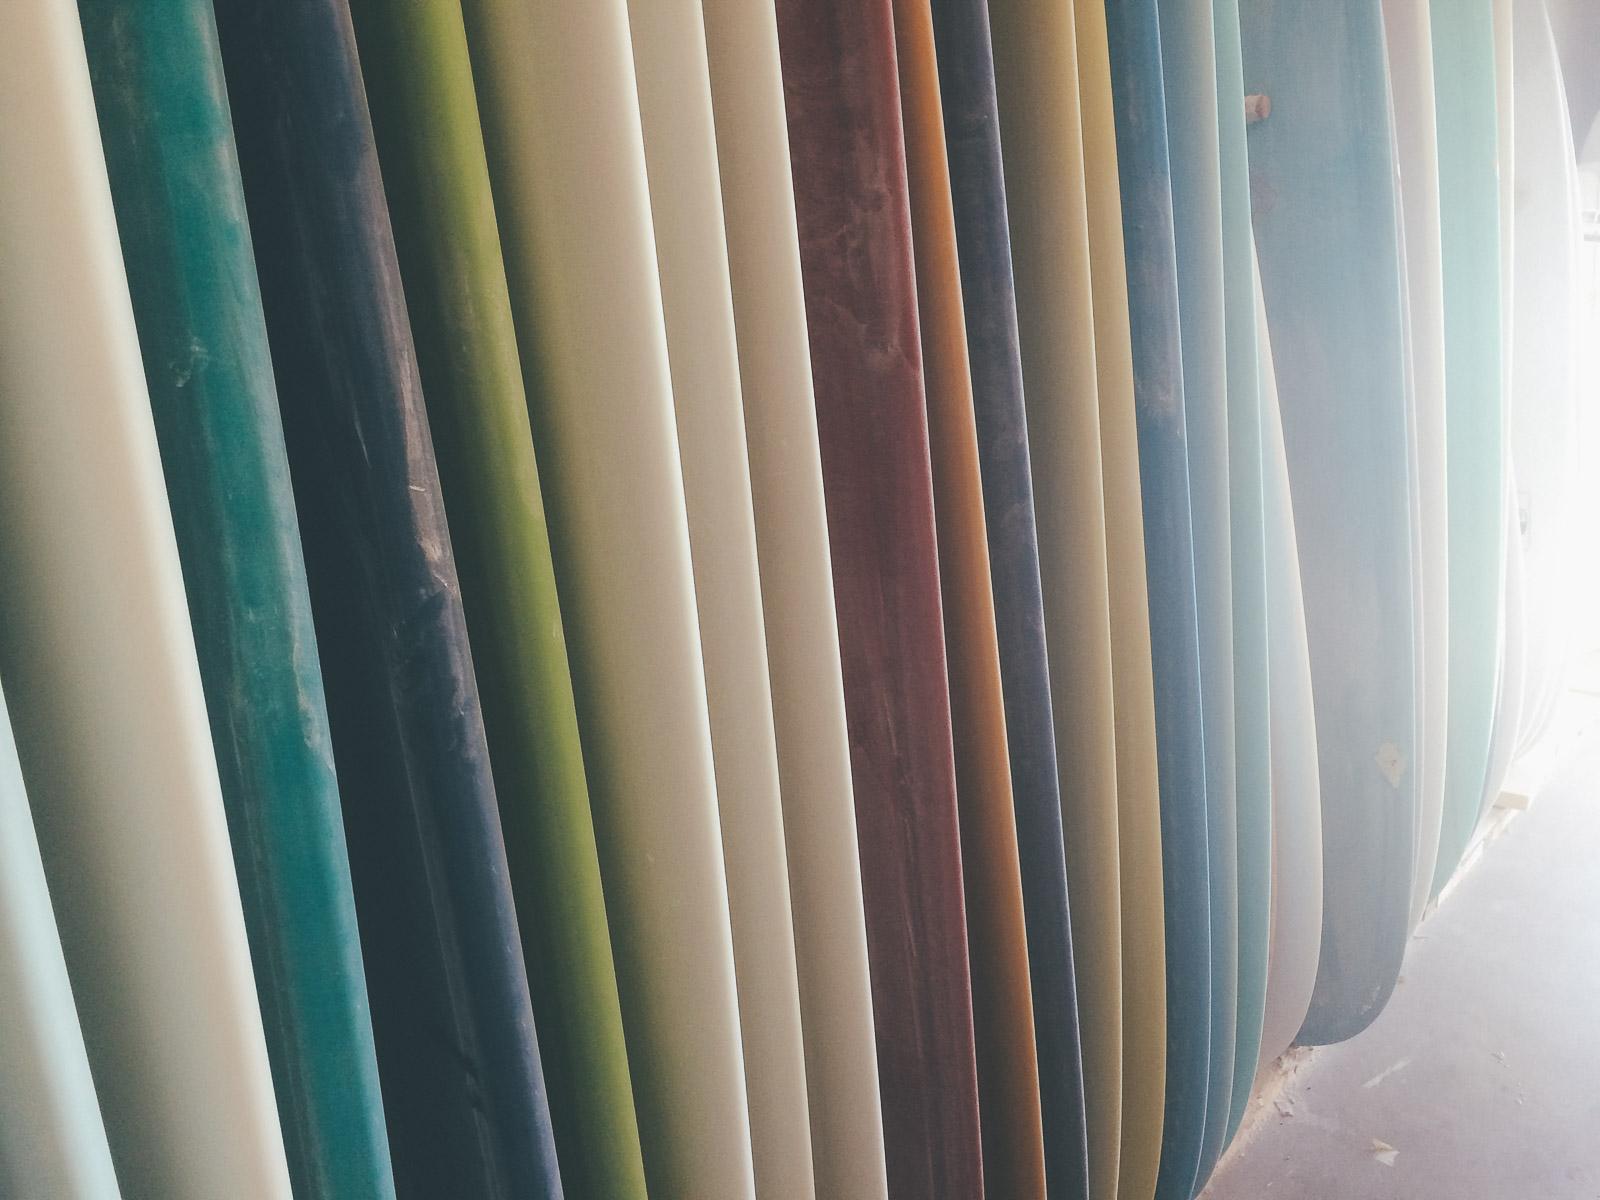 Sunshinestories-surf-travel-blog-IMG_5277